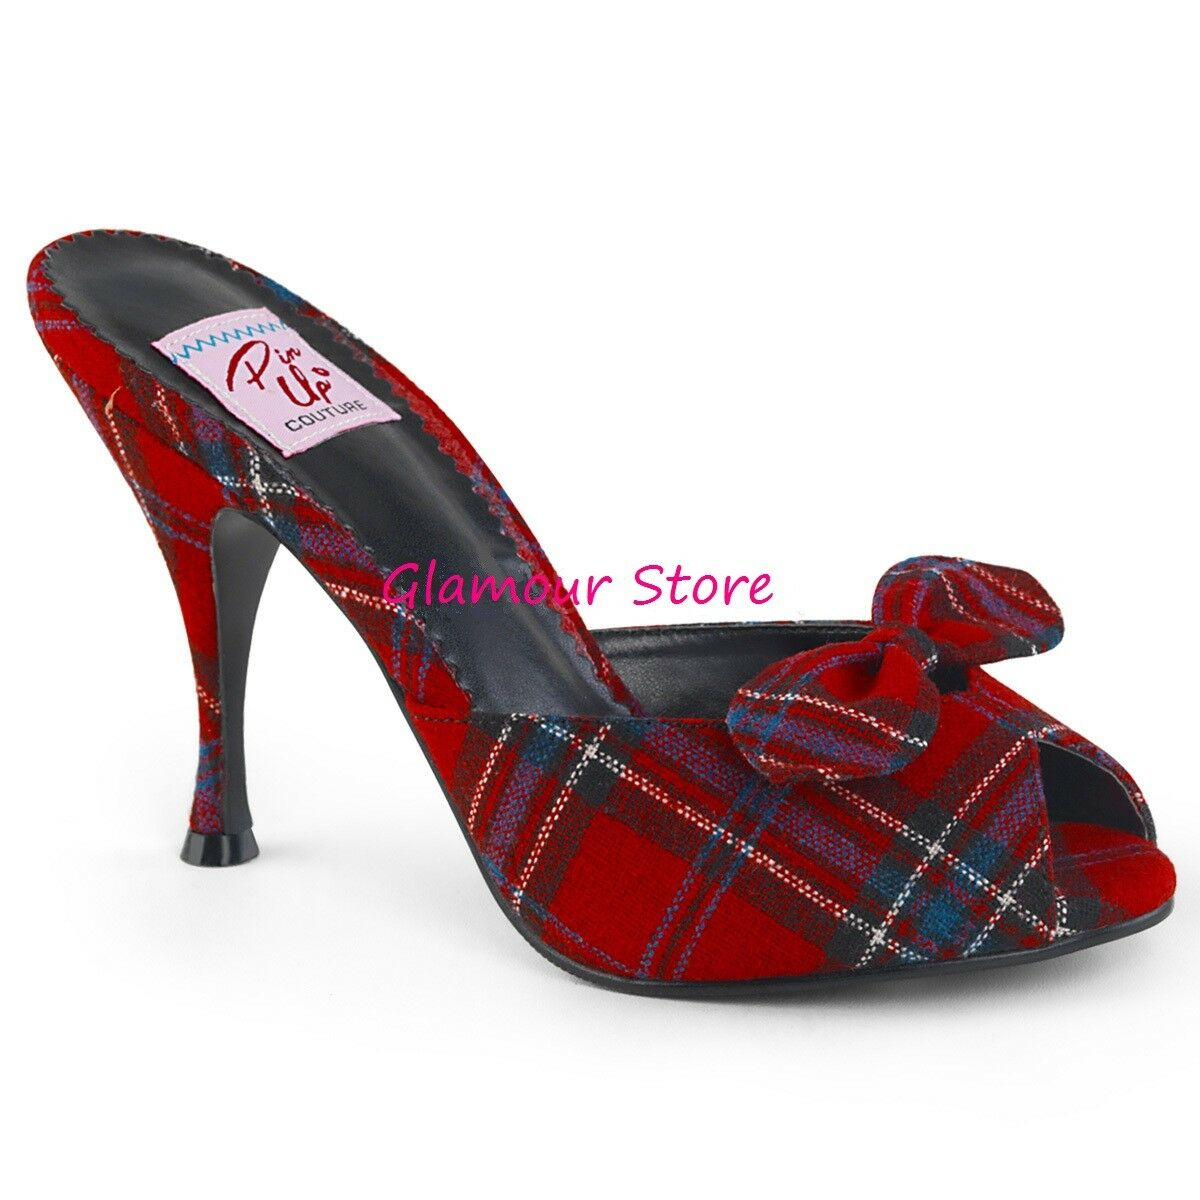 Sexy SANDALI sabot tacco 11 dal 35 al 41 LEOPARD, black, red SCOZZESE shoes